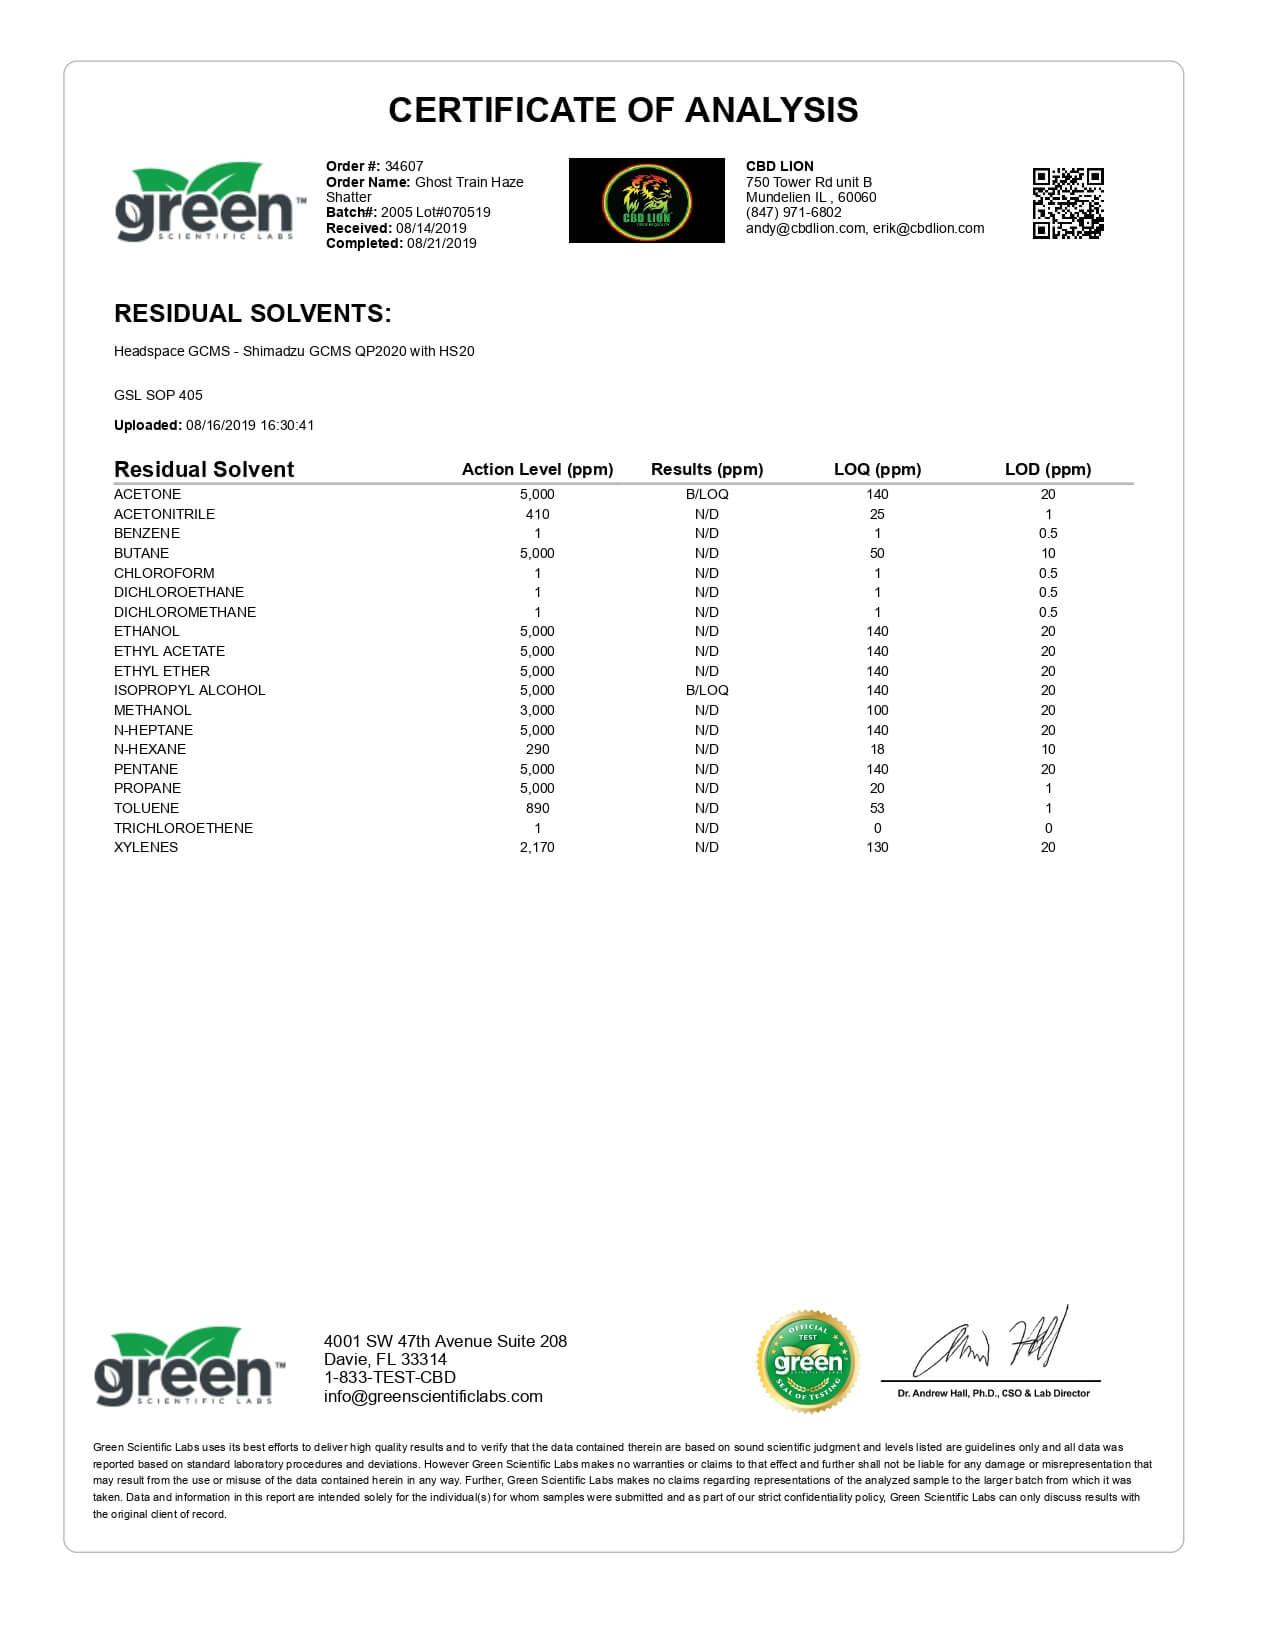 CBD Lion CBD Concentrate Ghost Train Haze Shatter 0.5g Lab Report